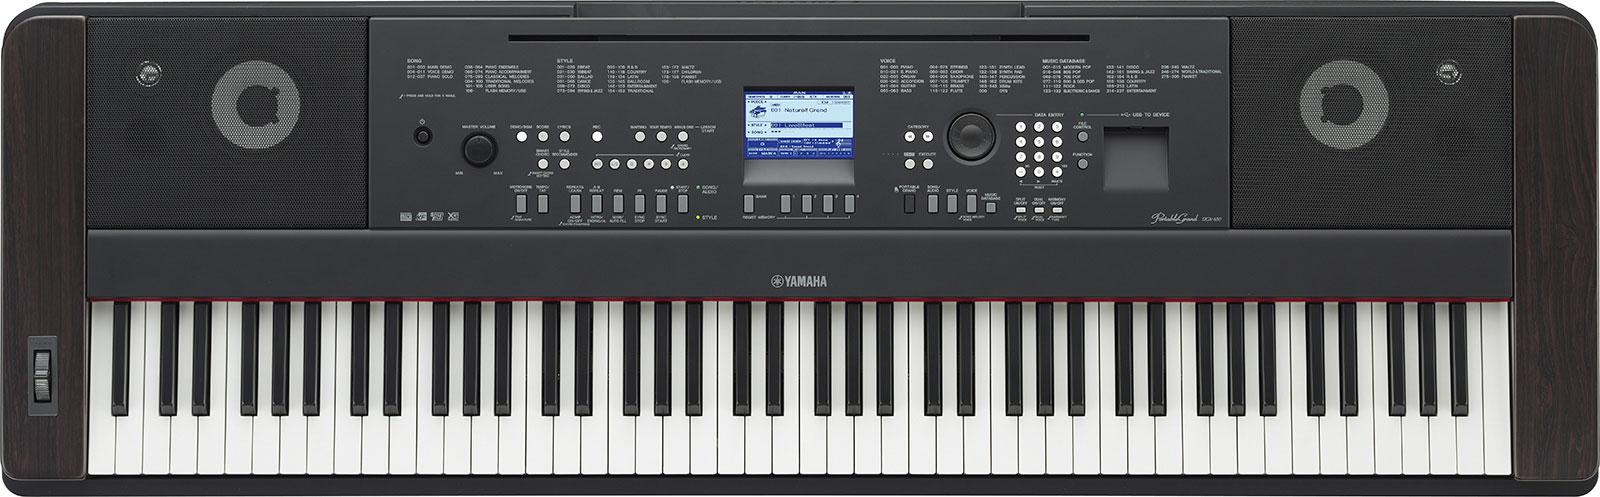 Yamaha Dgx White